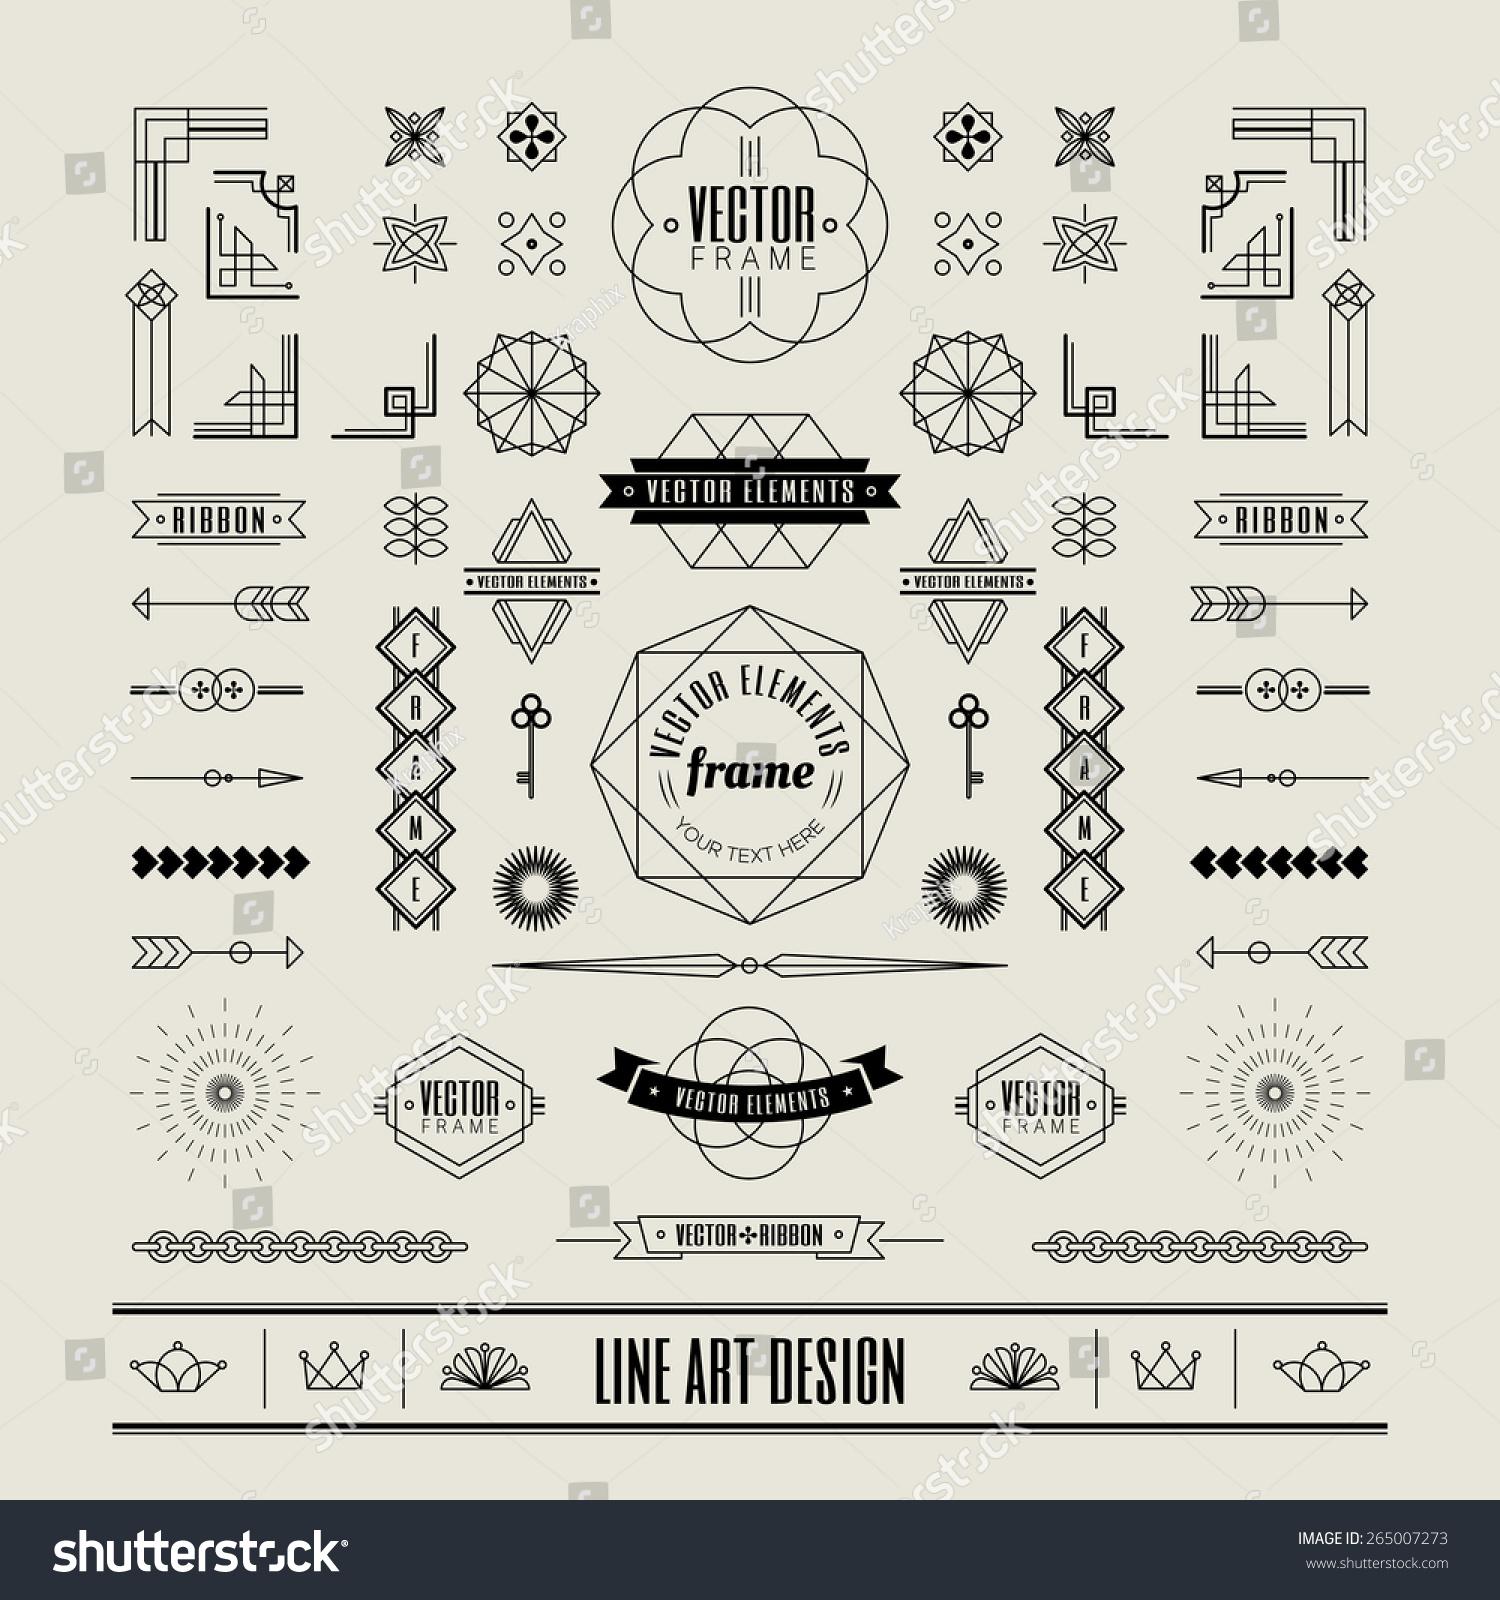 Art Deco Line Design : Set of linear thin line art deco retro vintage design